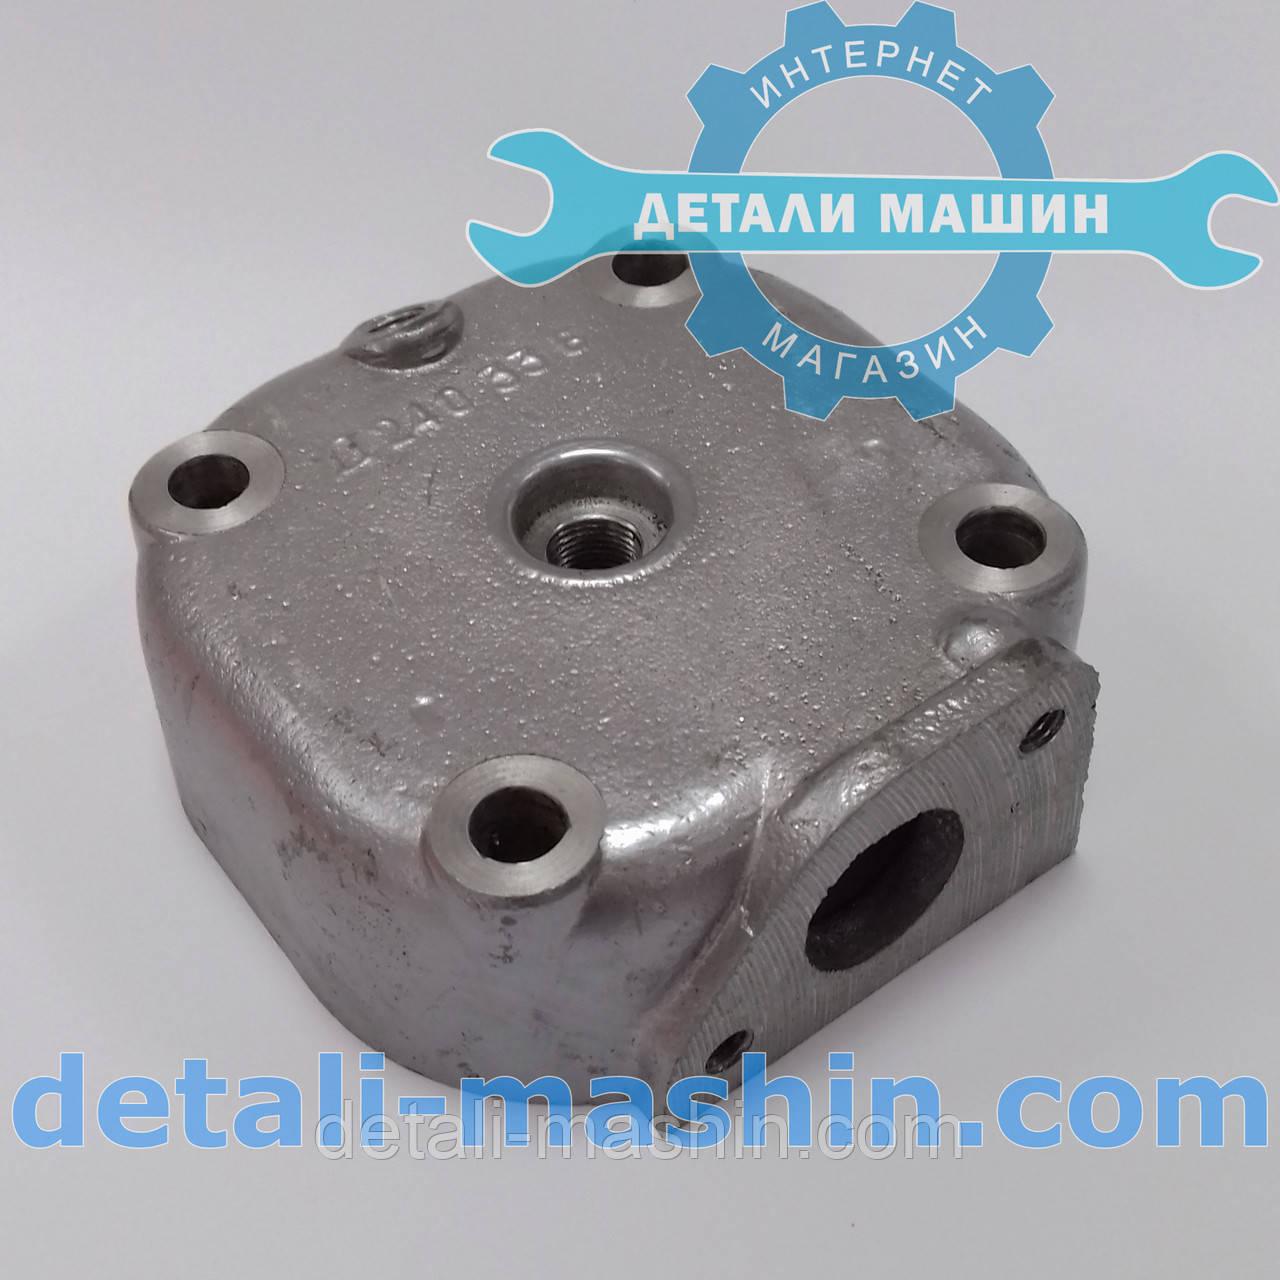 Головка гильзы (цилиндра) пускового двигателя ПД-10 ПД-350 Д24.033-Б